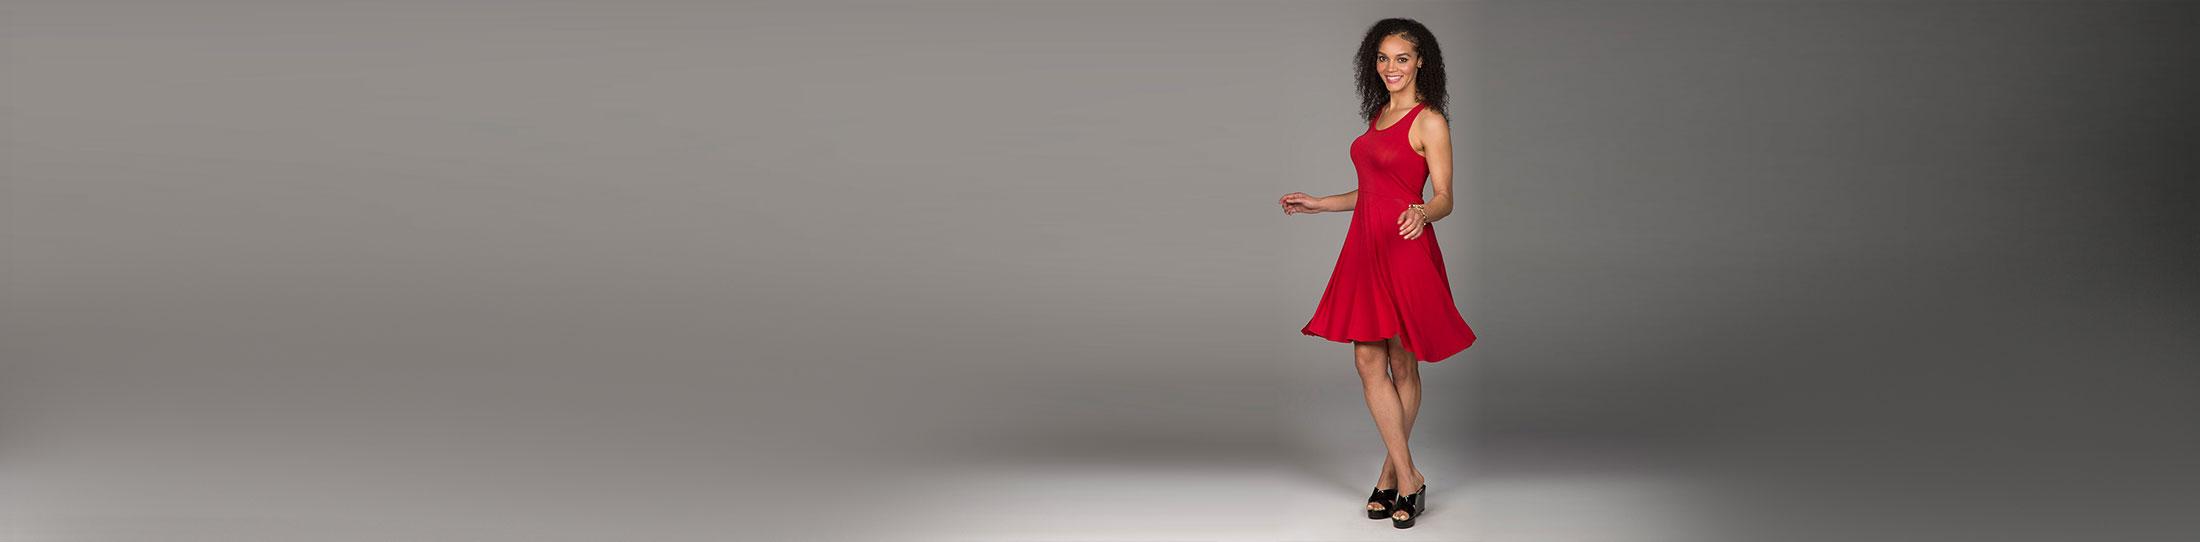 product-category-banner-short-dresses.jpg